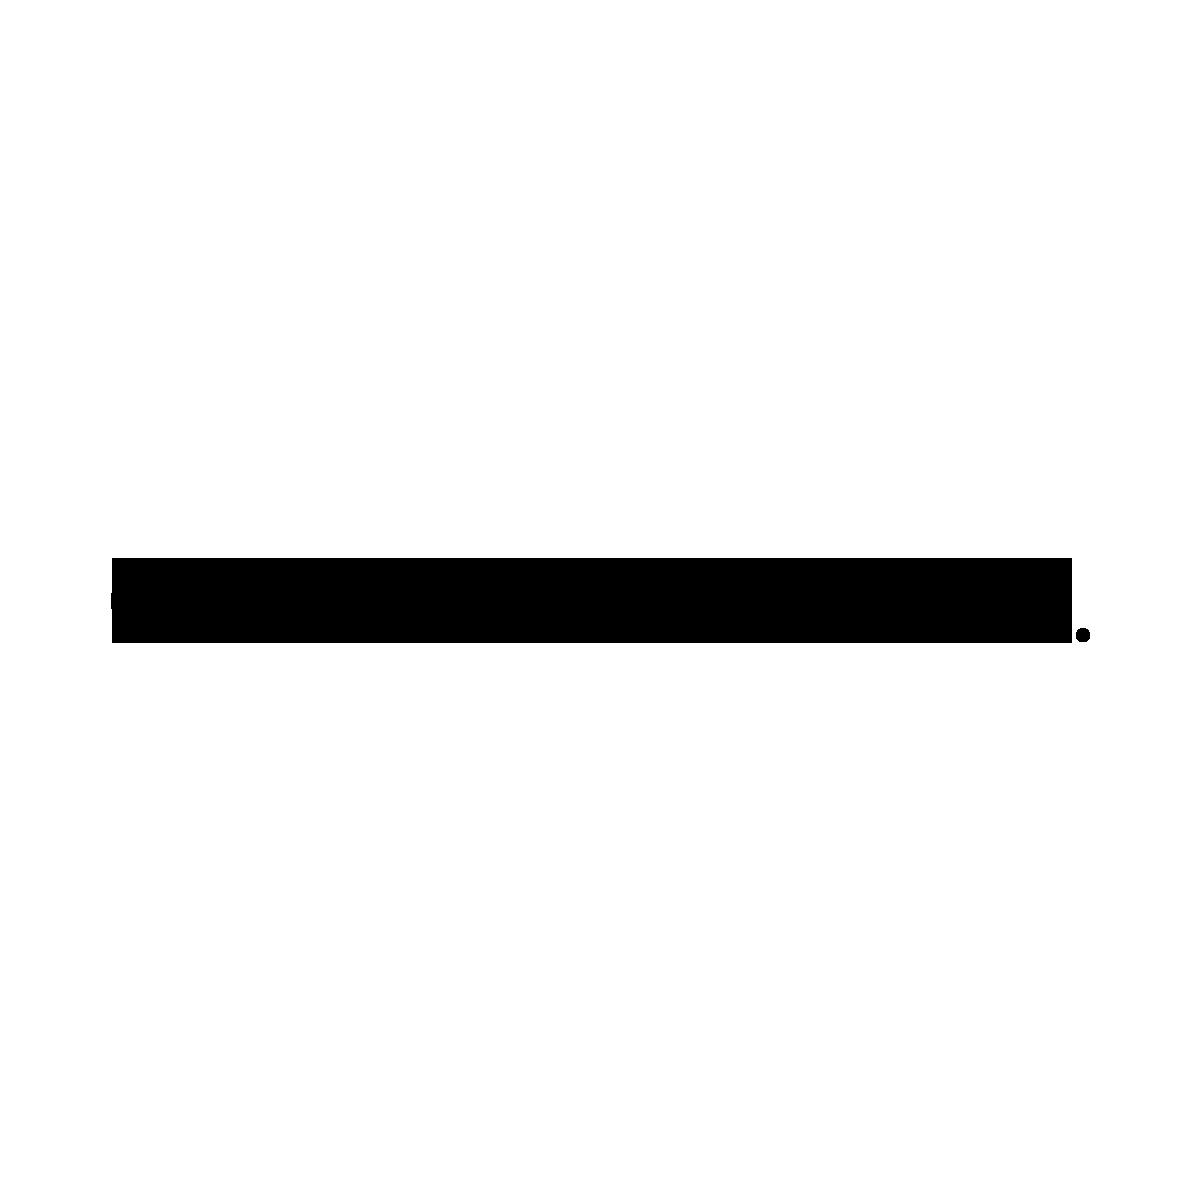 fred de la bretoniere zakelijke tas met ritssluiting in taupe leer 262134 binnenkant steekvak